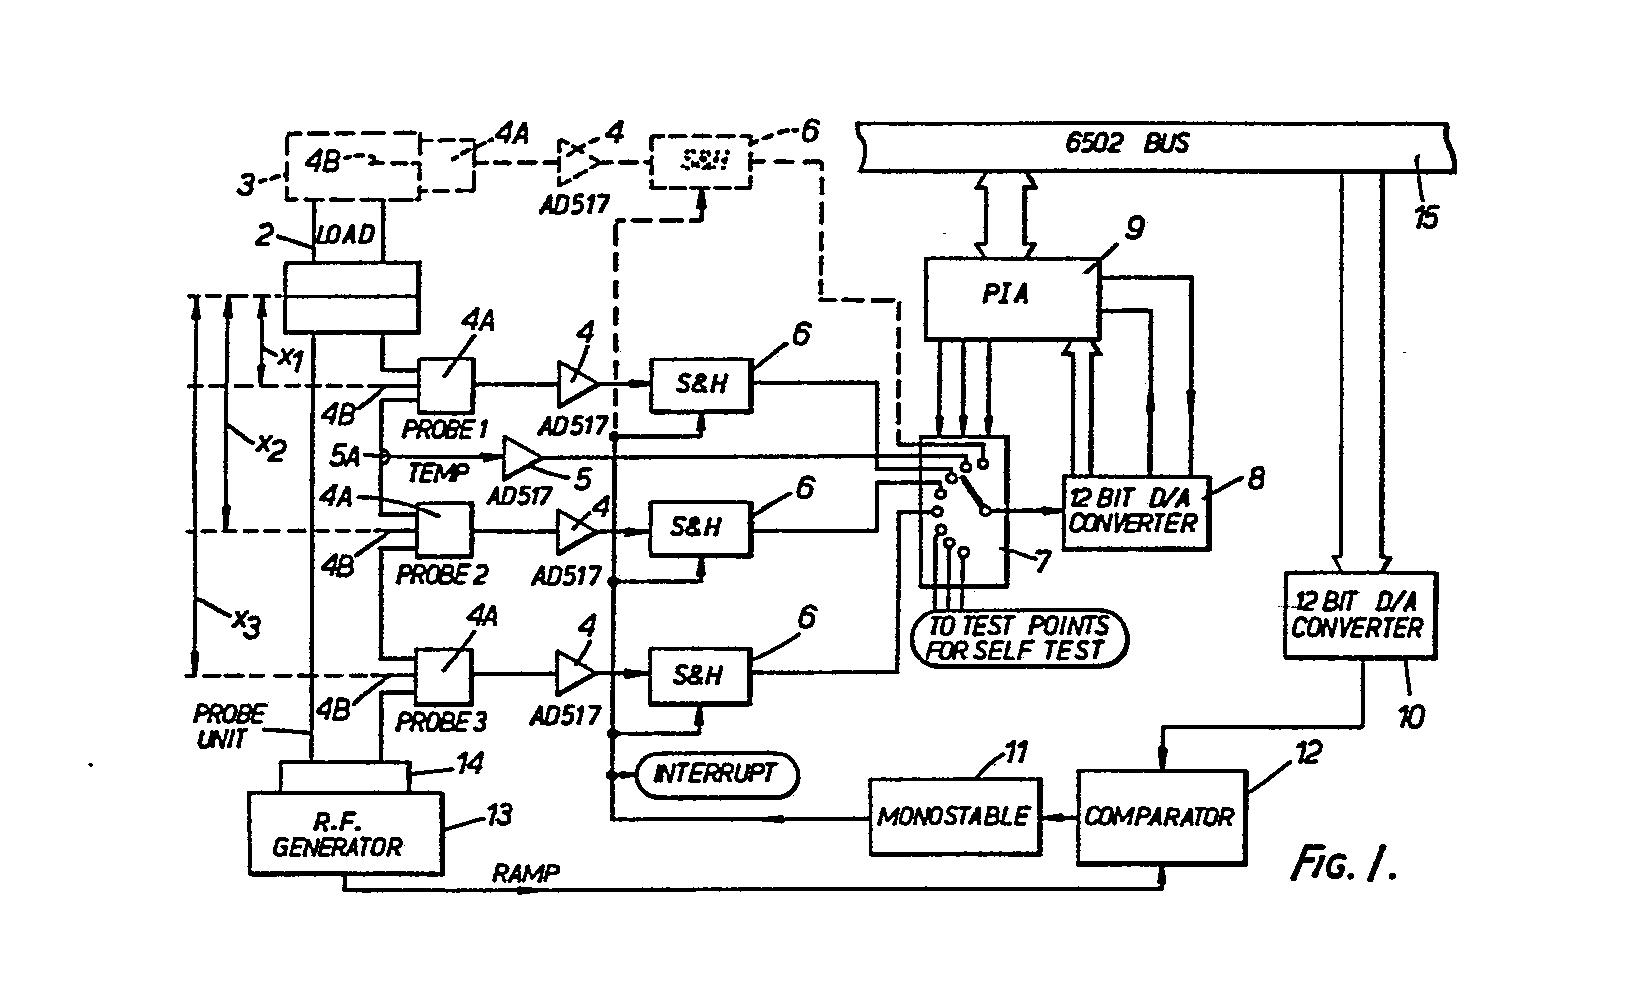 Microwave impedance measurement apparatus - Patent 0064413